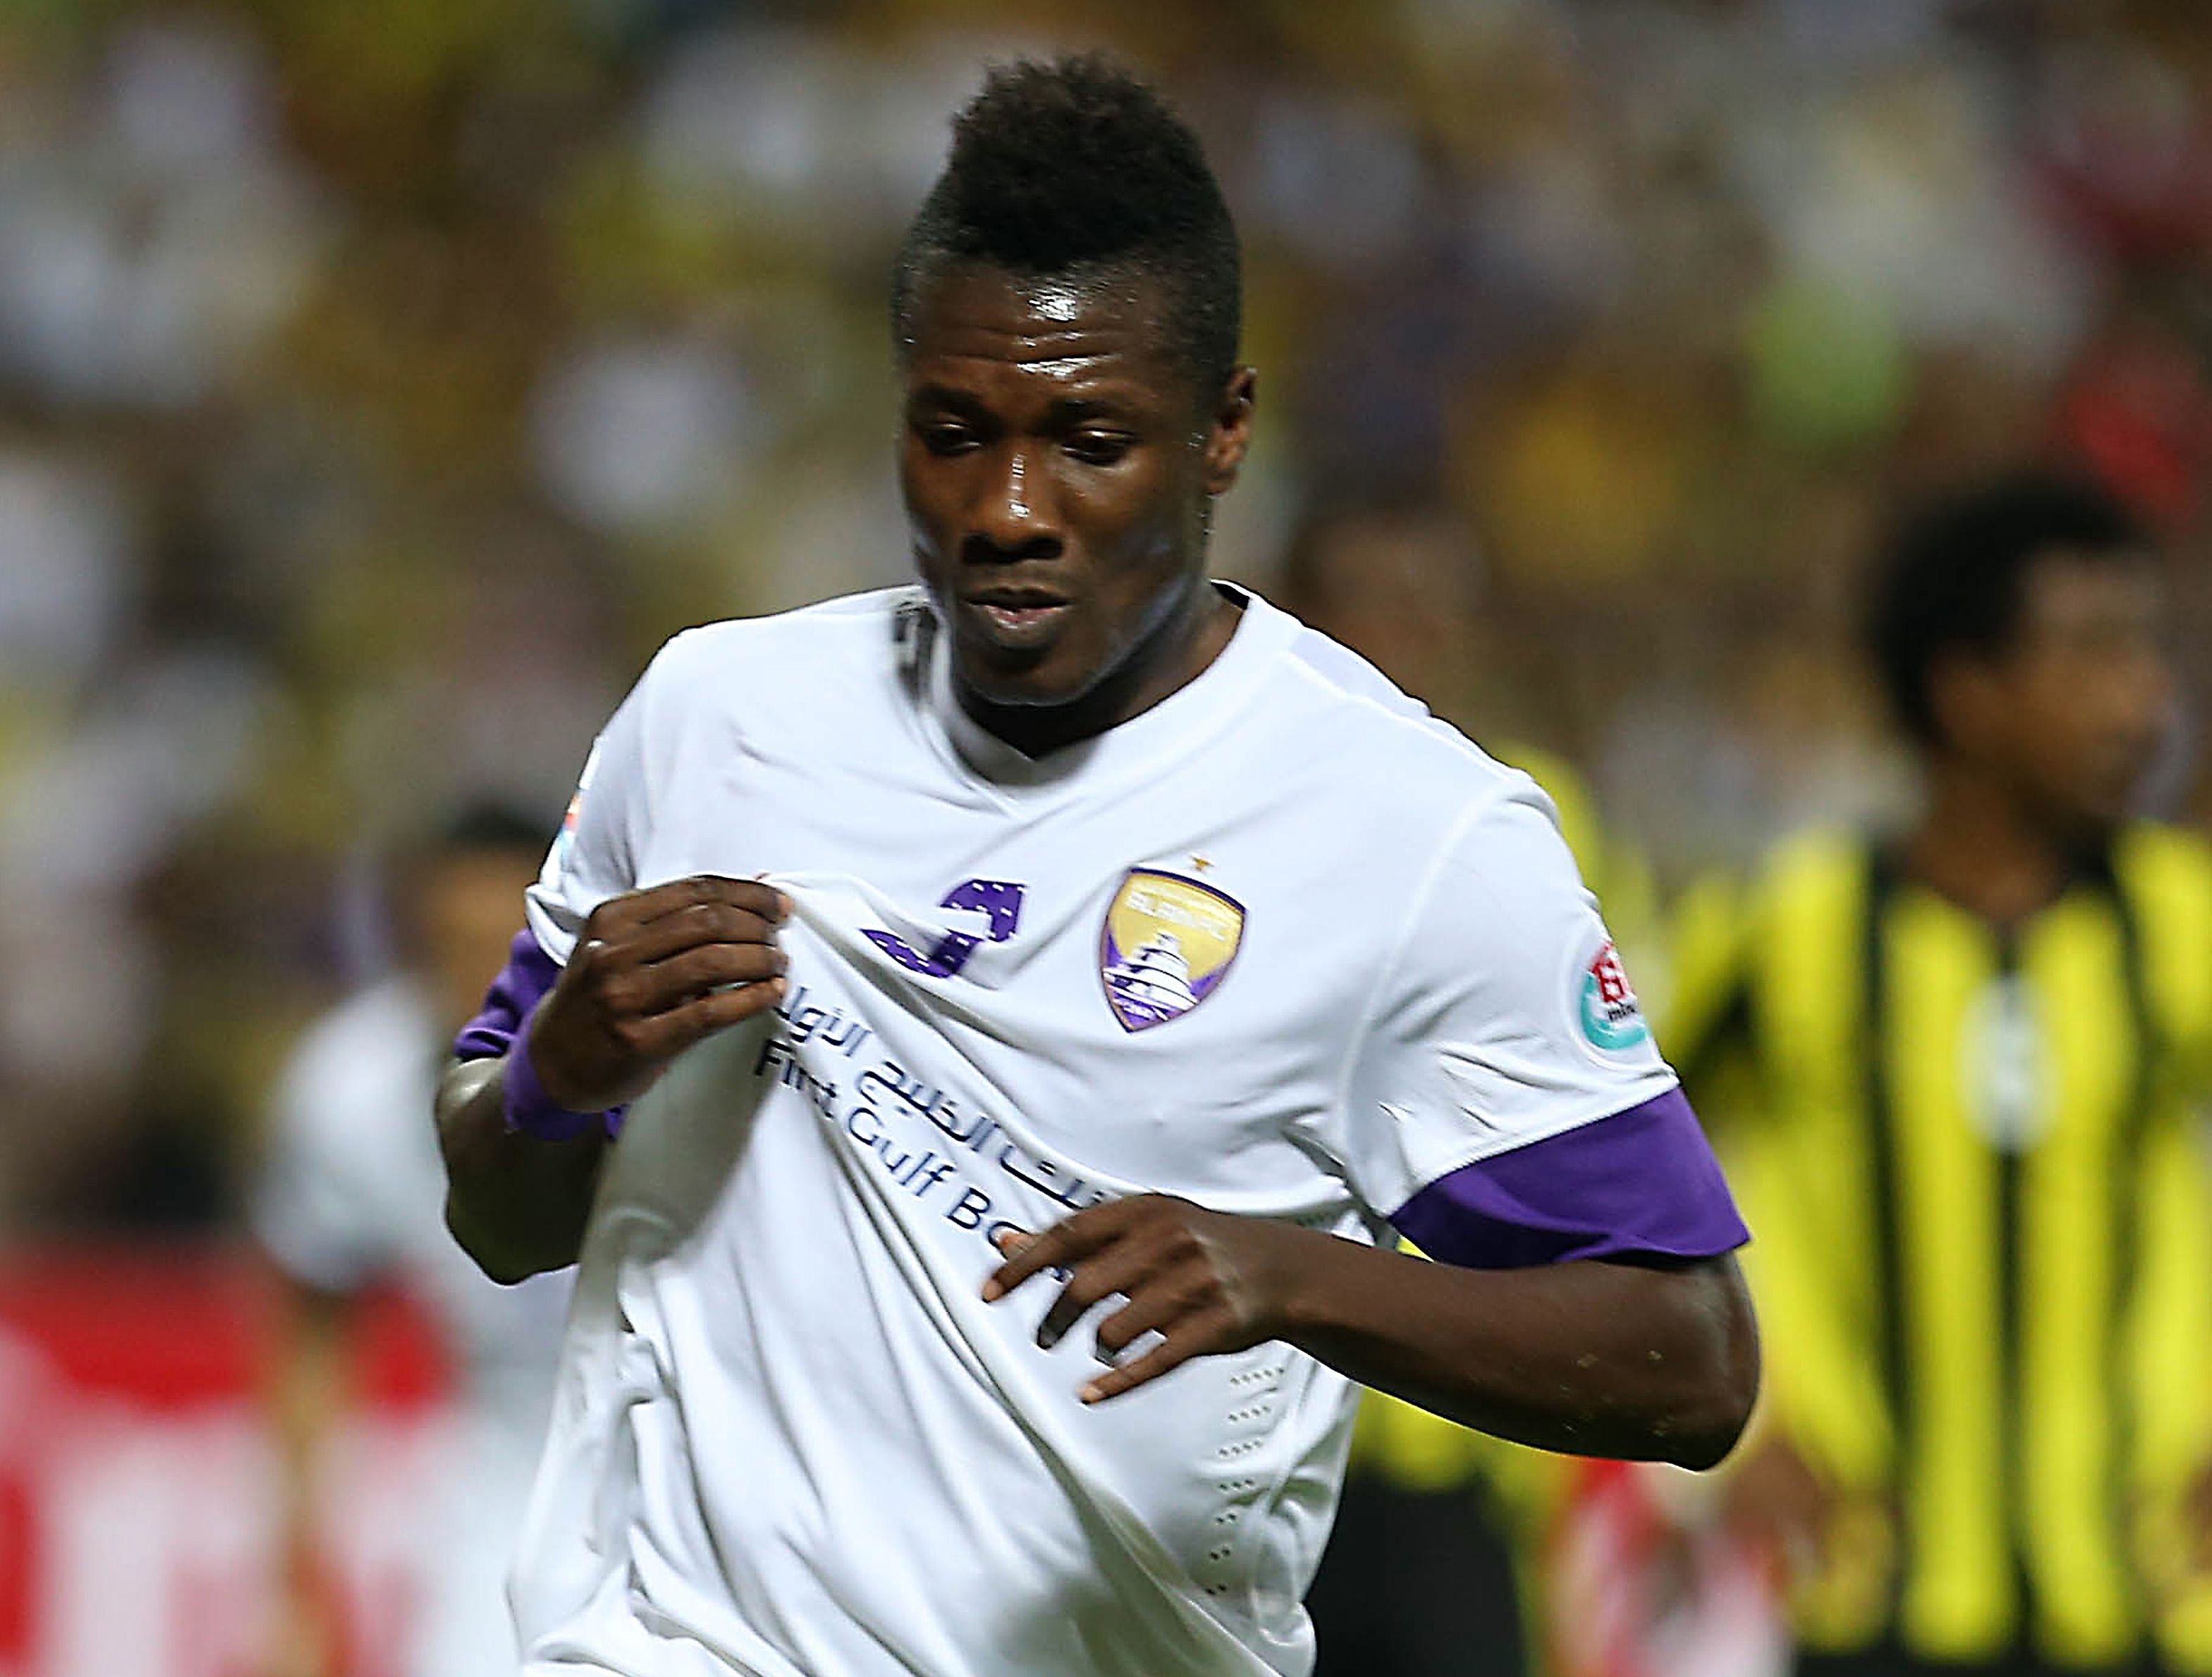 Asamoah Gyan scored for Al Ain on Saturday